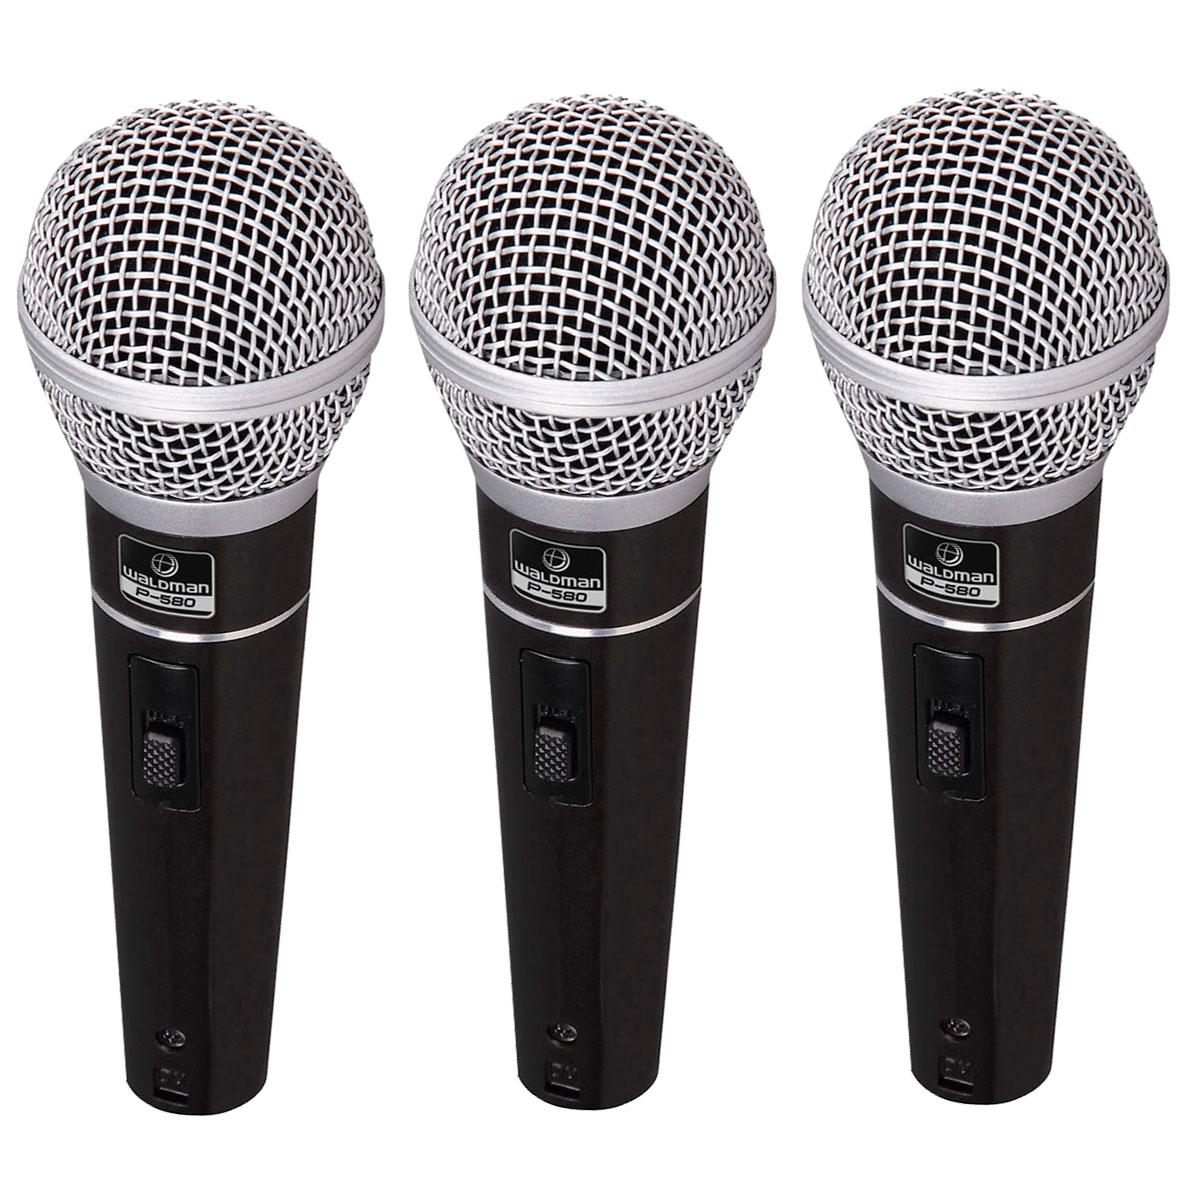 P5803PC - Kit 3 Microfones c/ Fio de Mão P 580 3PC - Waldman